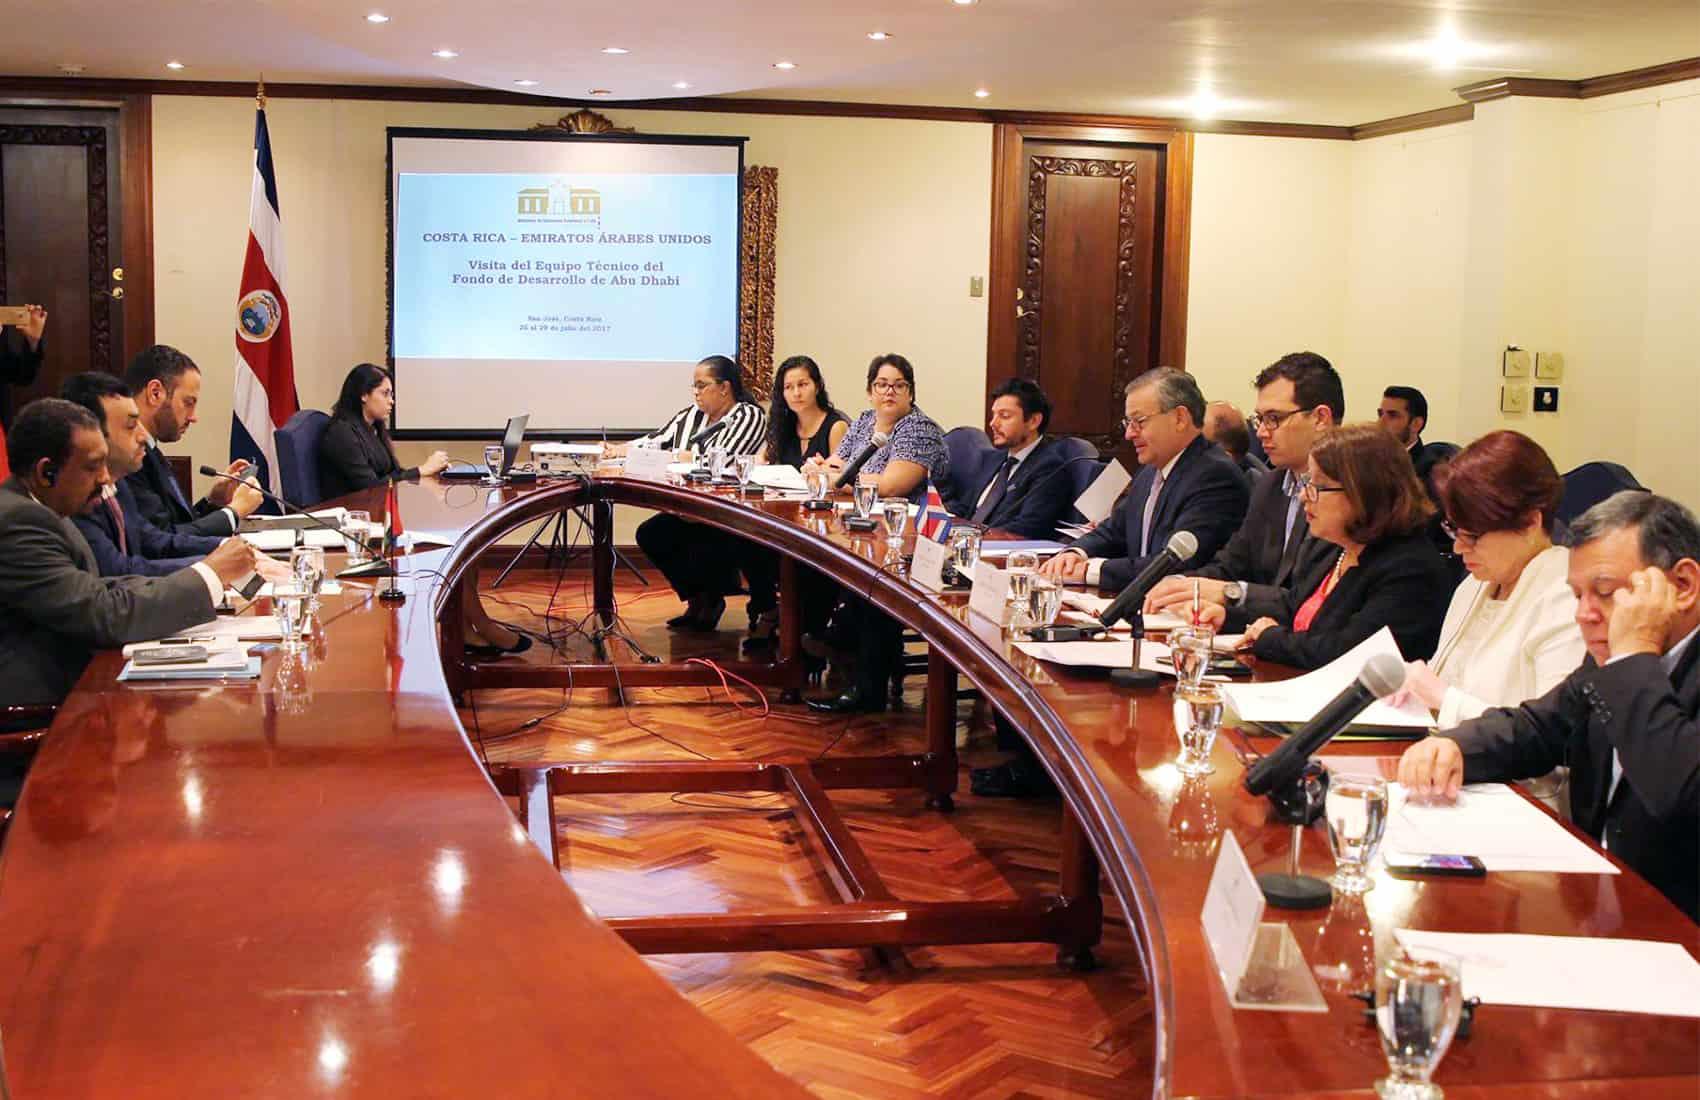 Costa Rica - AUE Abu Dhabi bilateral meeting. July 26, 2017.